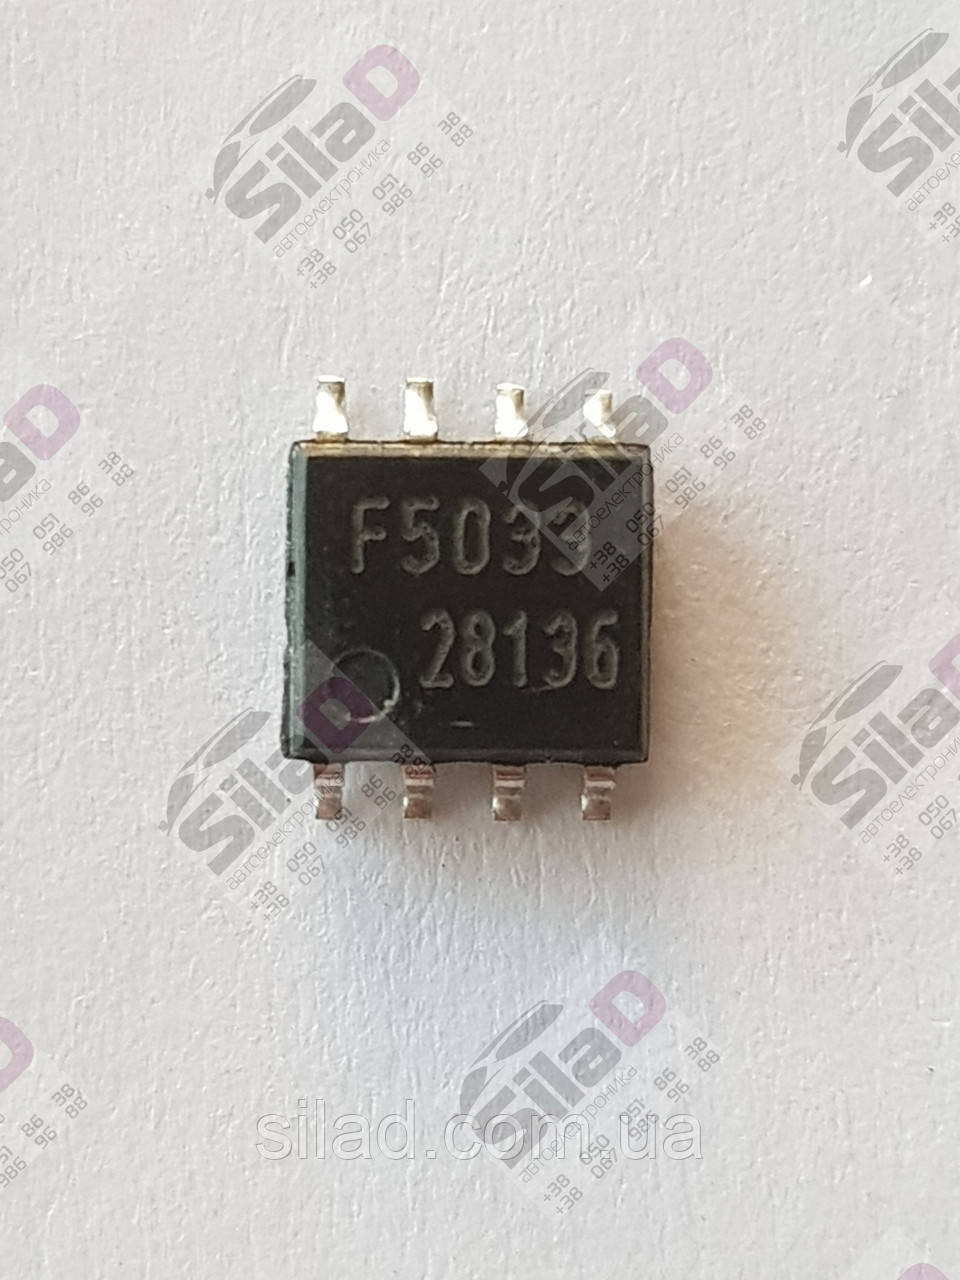 Микросхема F5033 Fuji Electric корпус SOP8